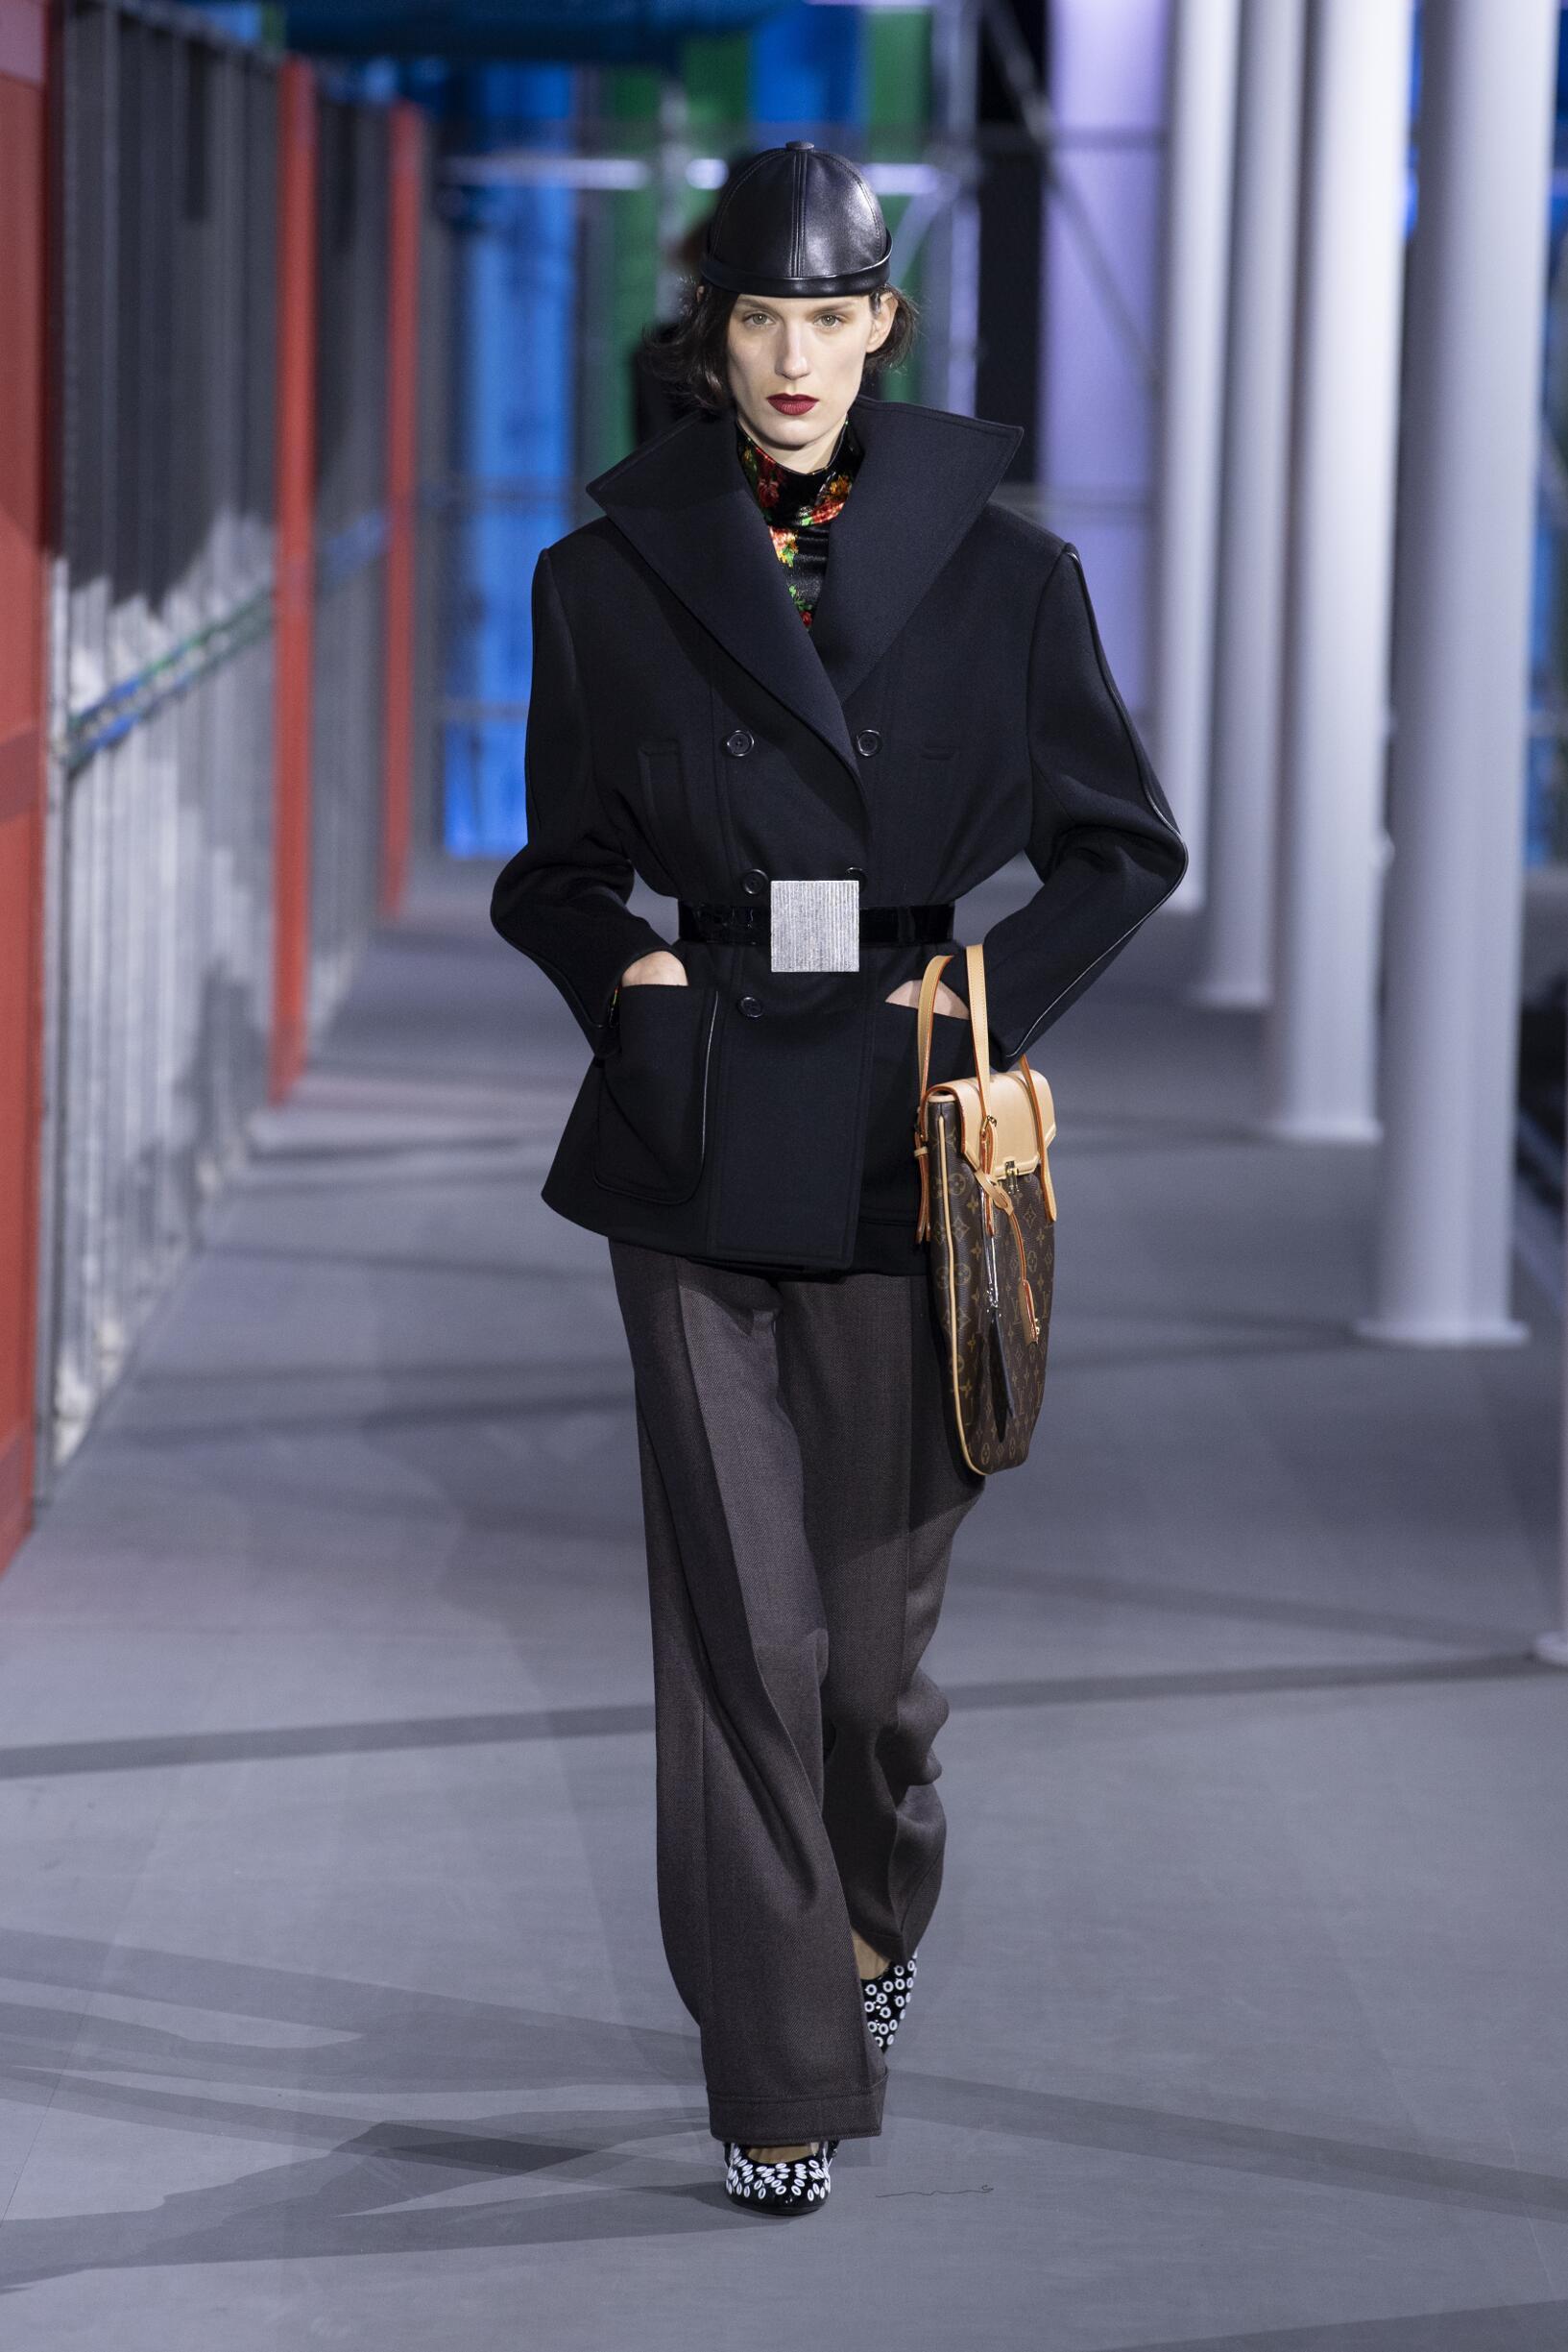 Louis Vuitton FW 2019 Womenswear